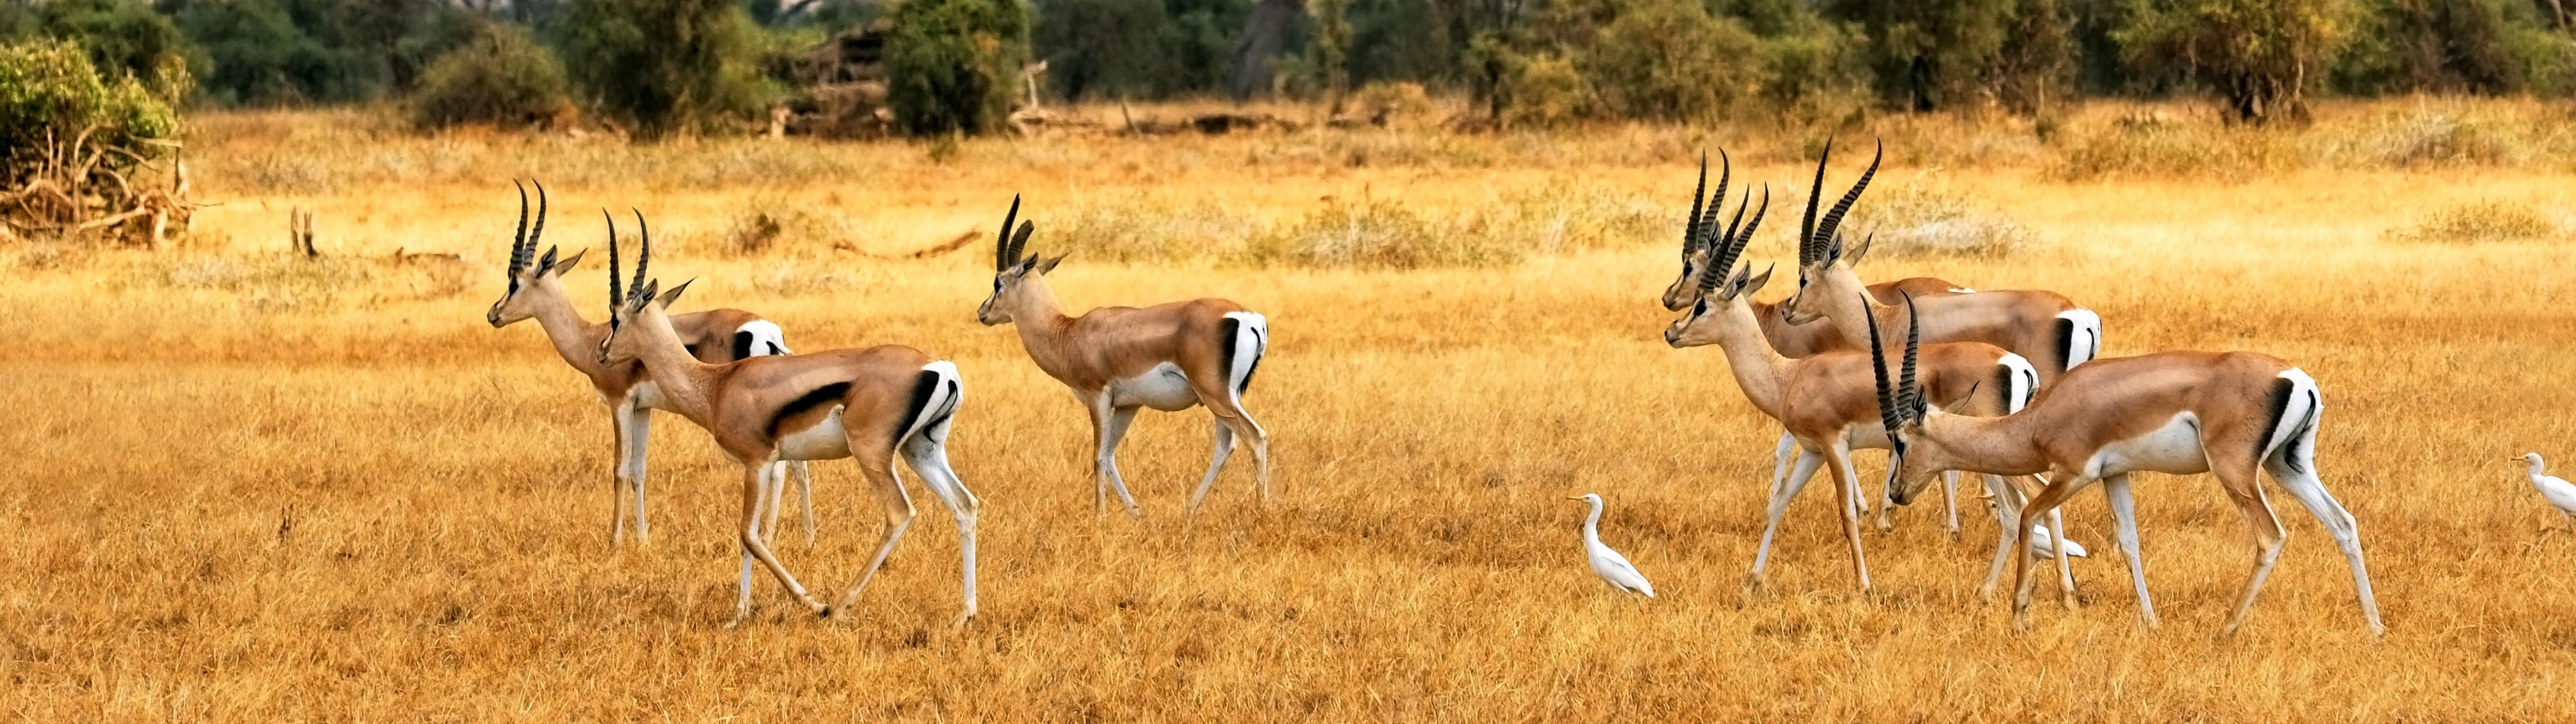 Antelopes Desktop Background Wallpaper Download 7680x2160